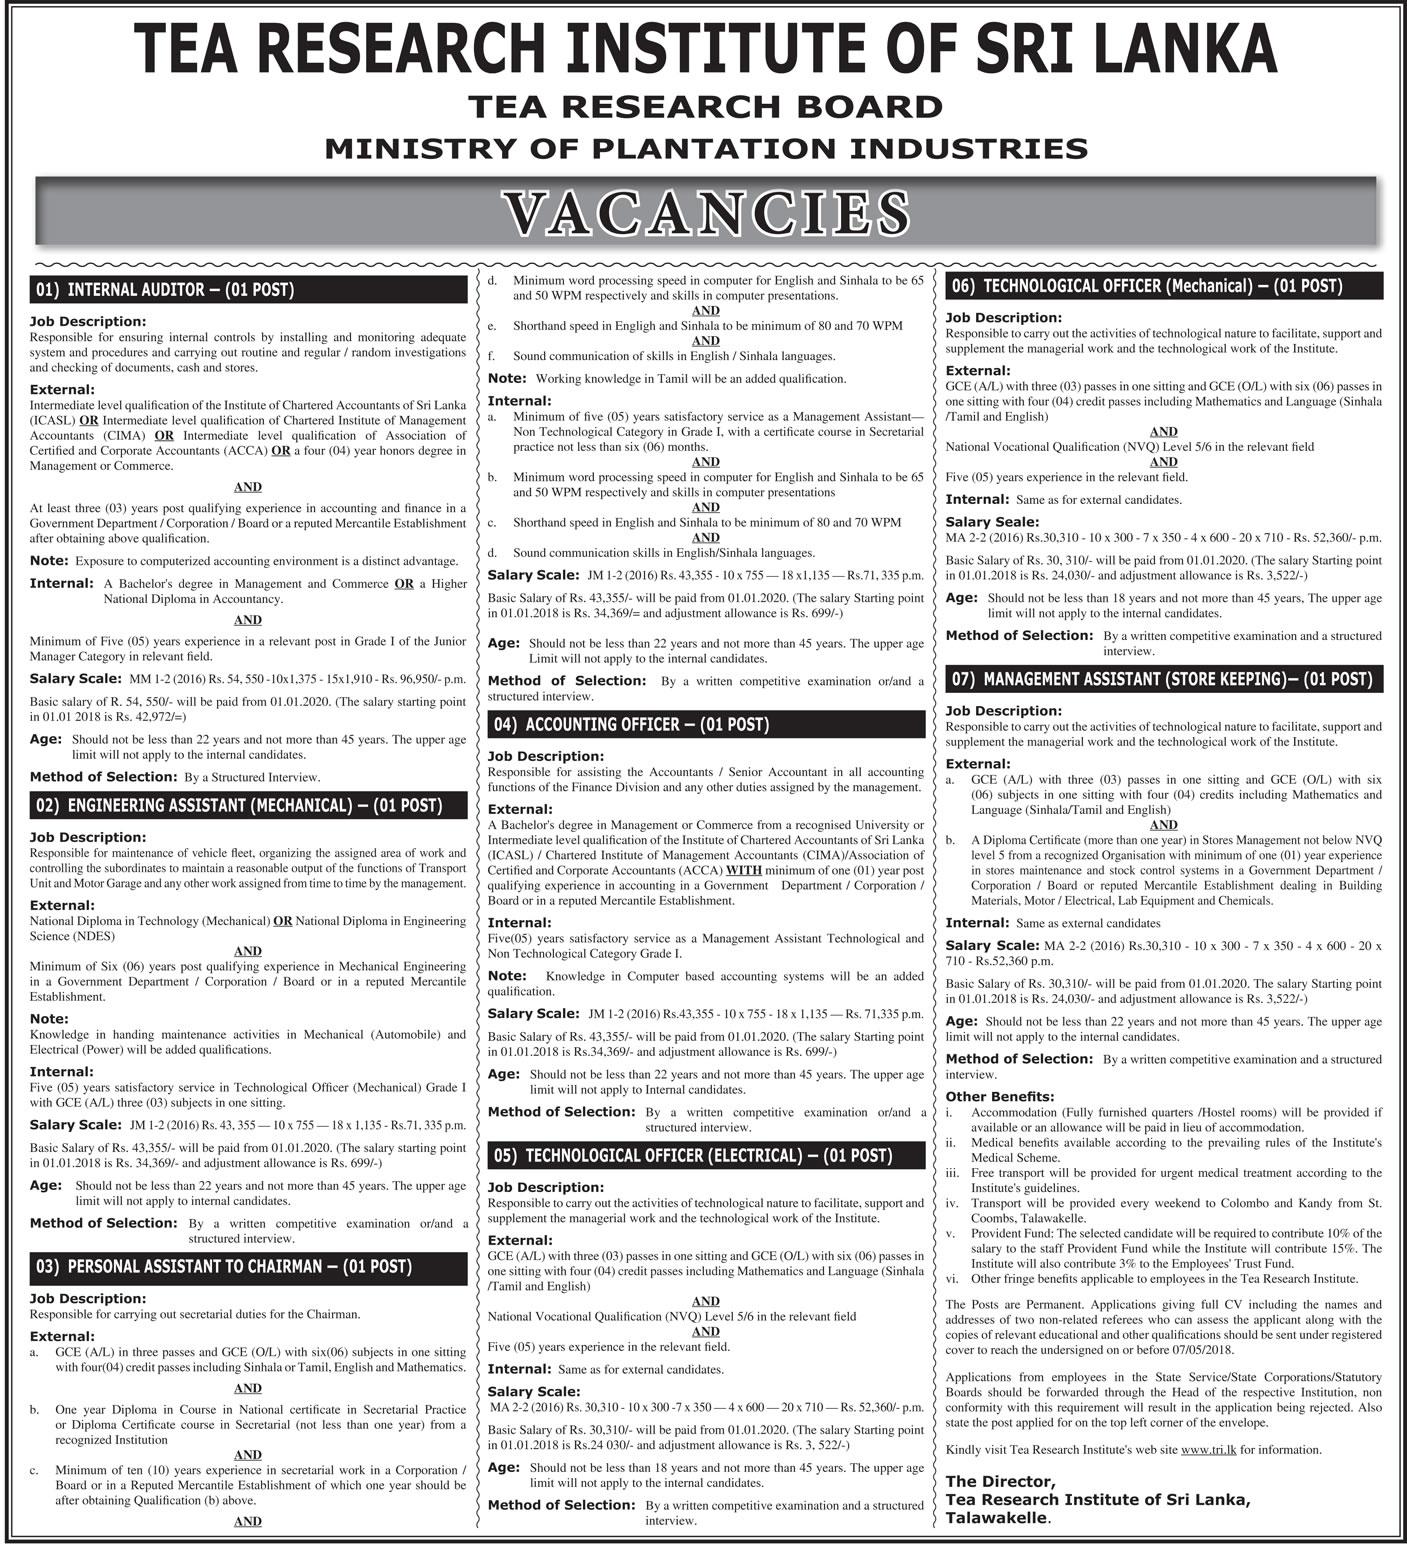 Tea Research Institute of Sri Lanka Vacancies